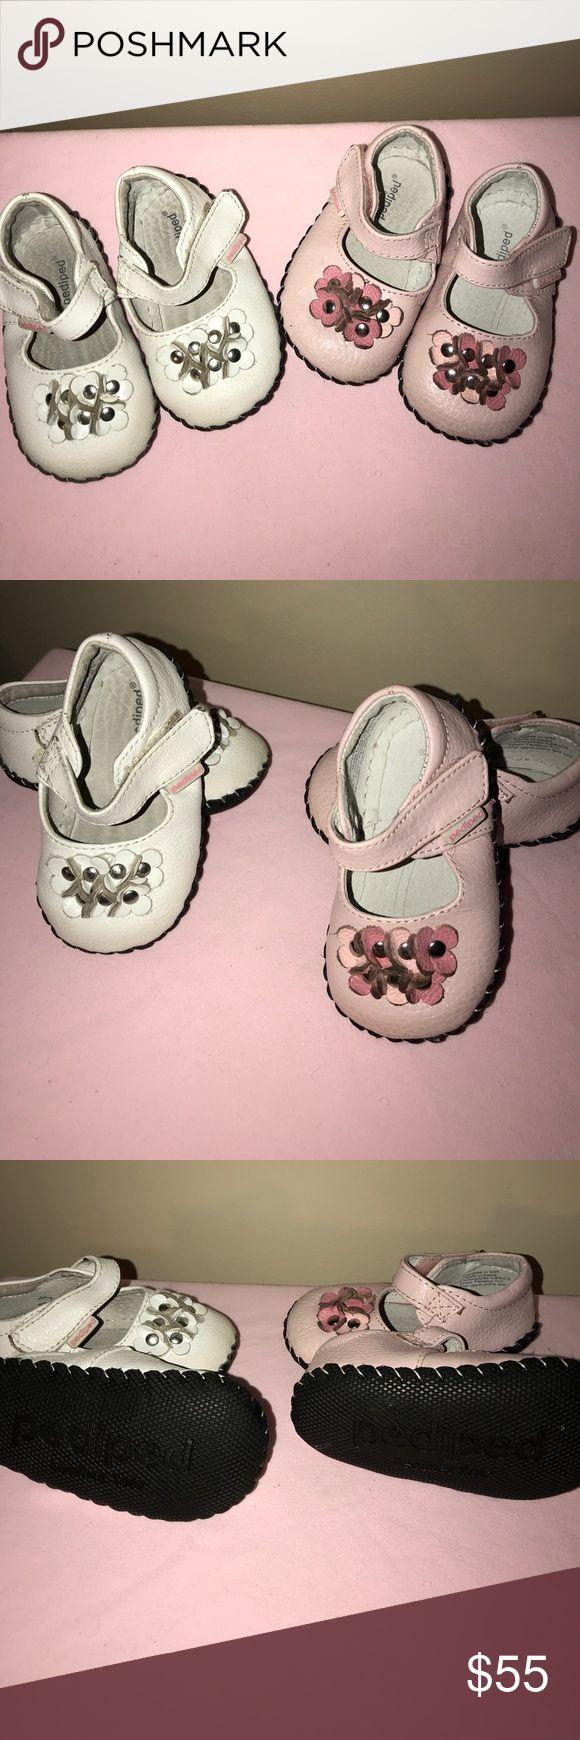 Infant shoes Pediped infant shoes size 6-12 months pediped Shoes Dress Shoes